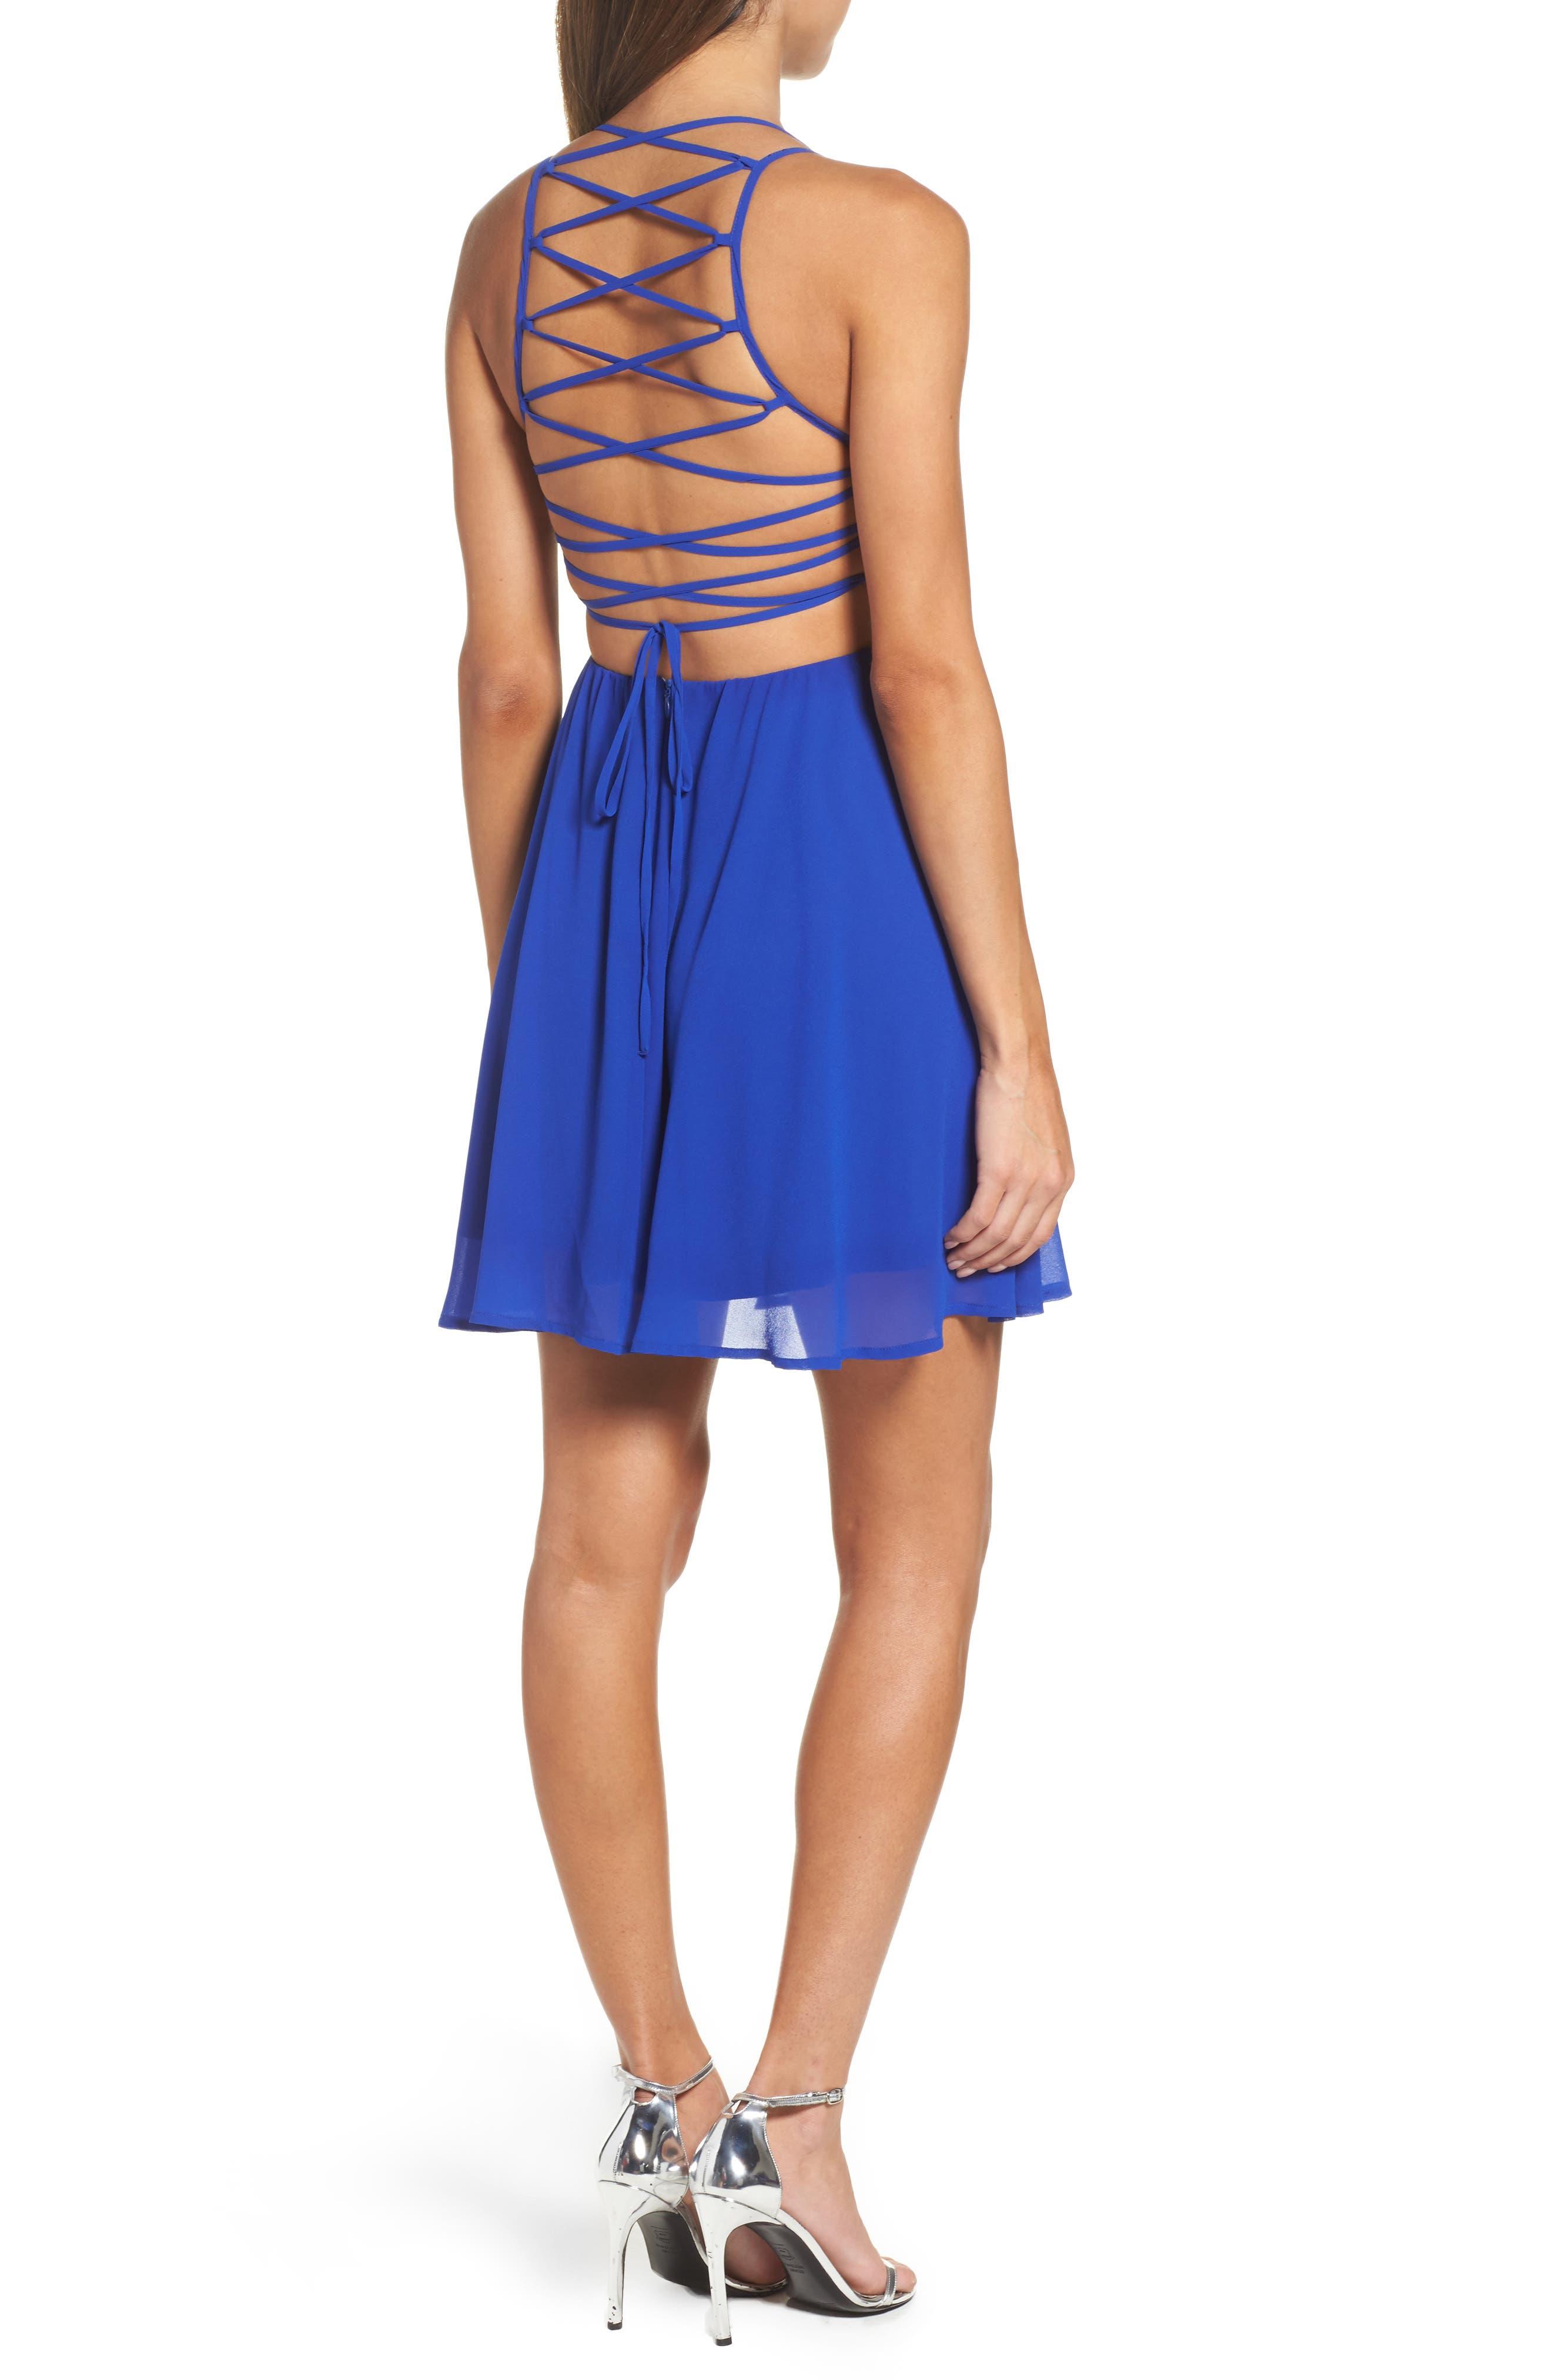 LULUS, Good Deeds Lace-Up Skater Dress, Alternate thumbnail 2, color, ROYAL BLUE